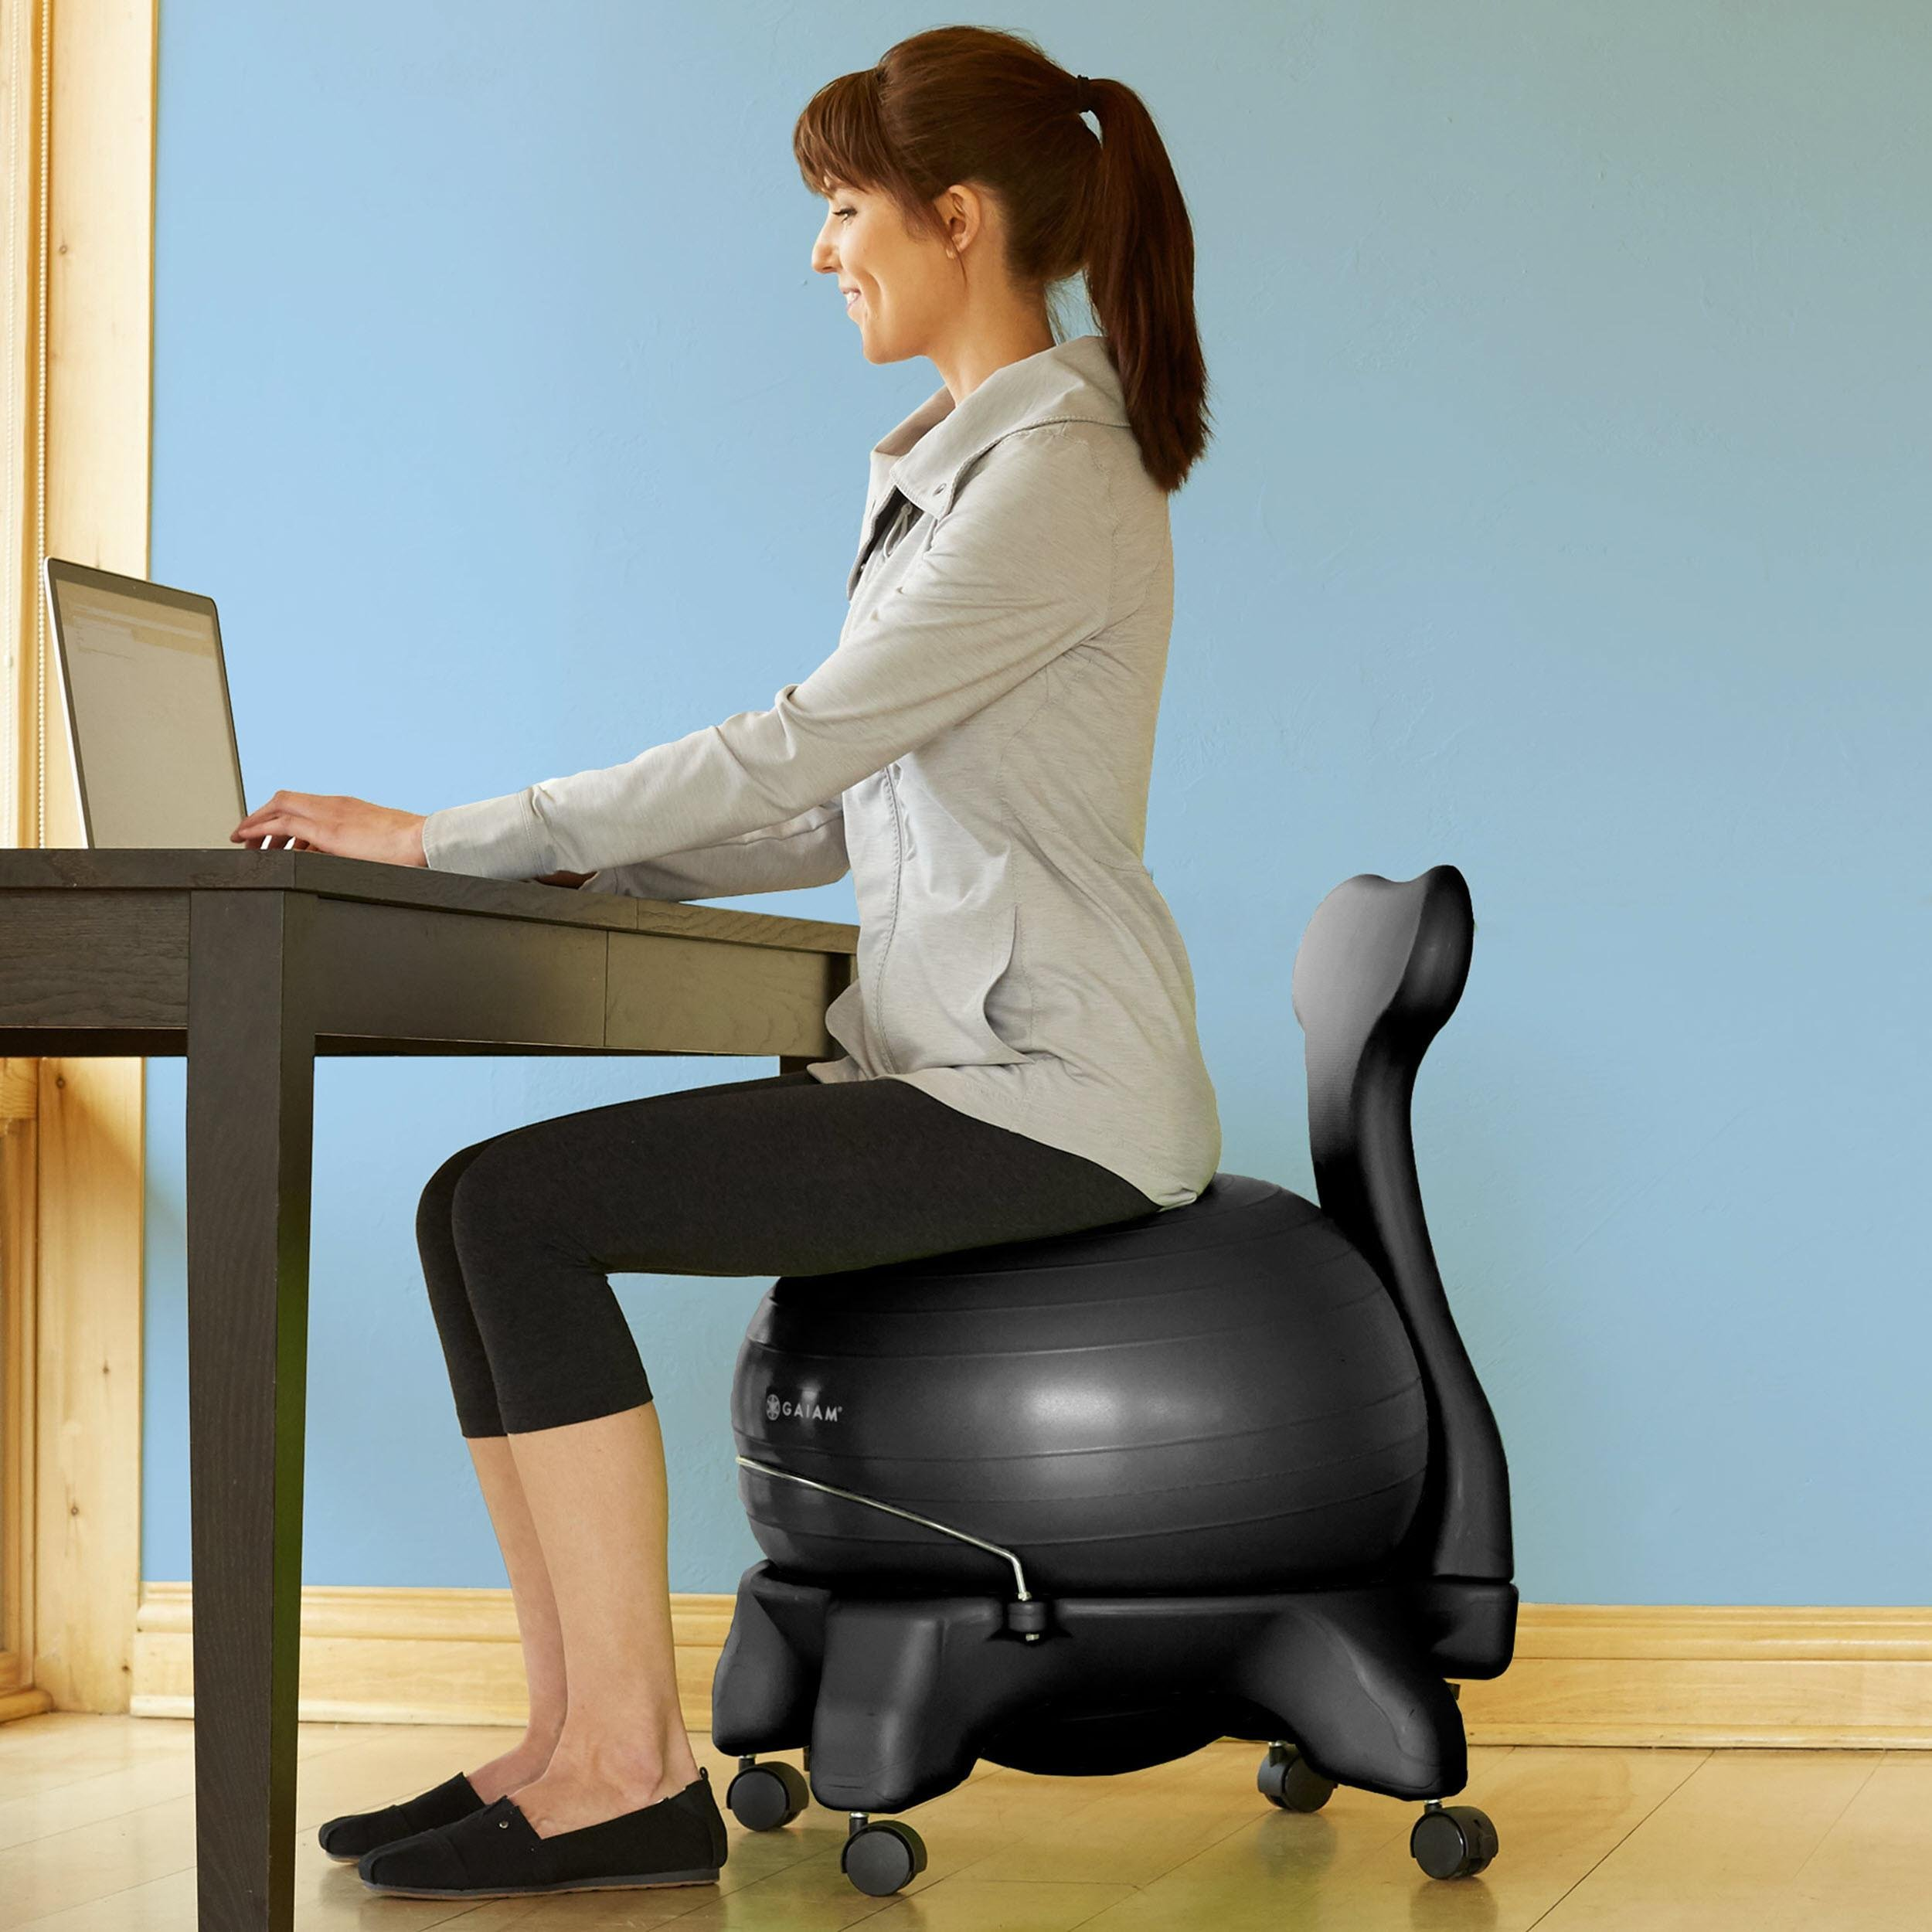 Gaiam Balance Ball Chair Inflation: Amazon.com : Gaiam Balance Ball Chair (Black) : Exercise